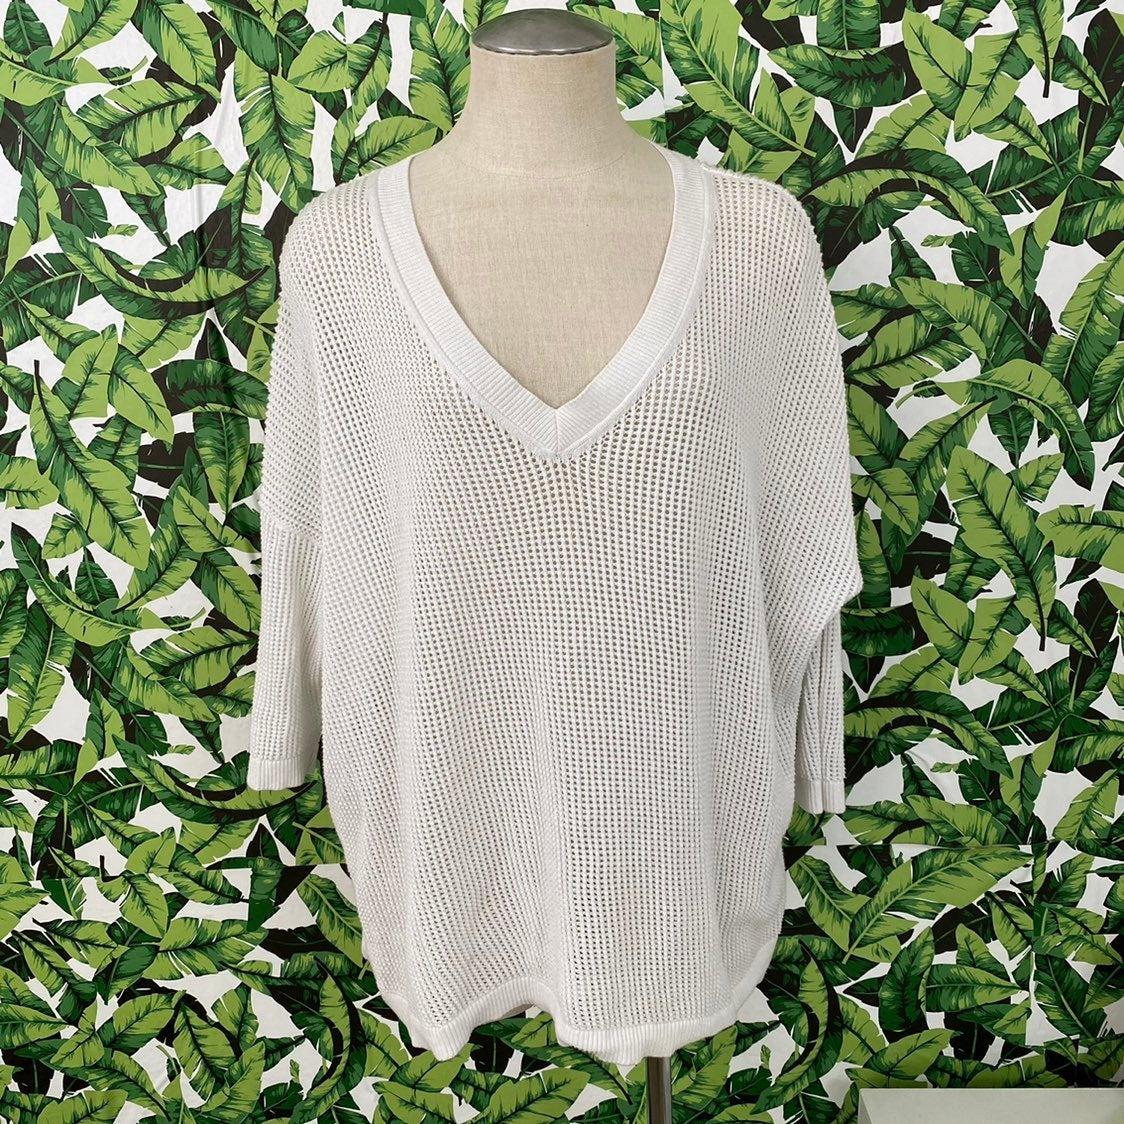 CAbi Breeze Cotton Open Knit Sweater 601